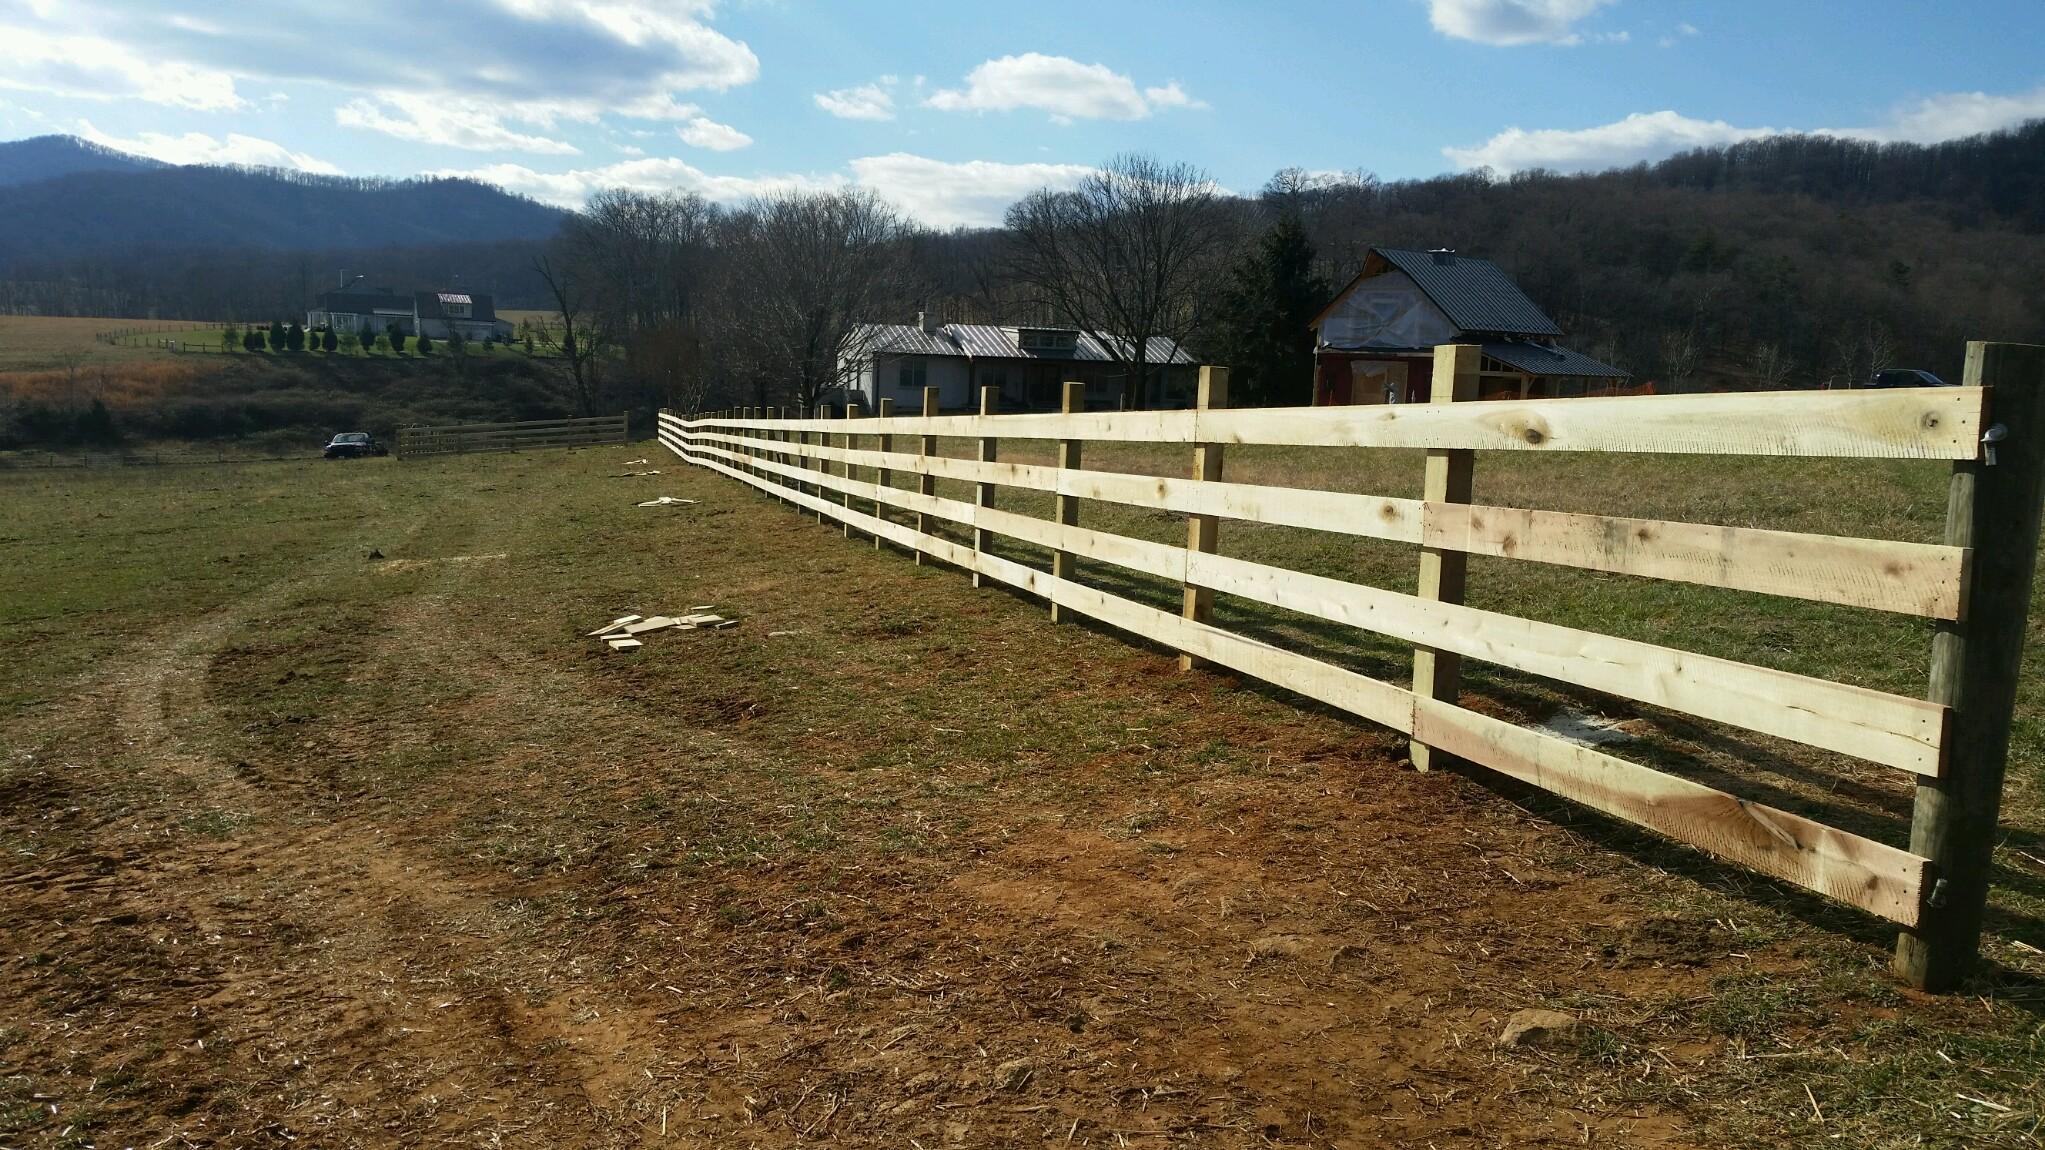 Four Board Fence At Bundoran Hilliard Management